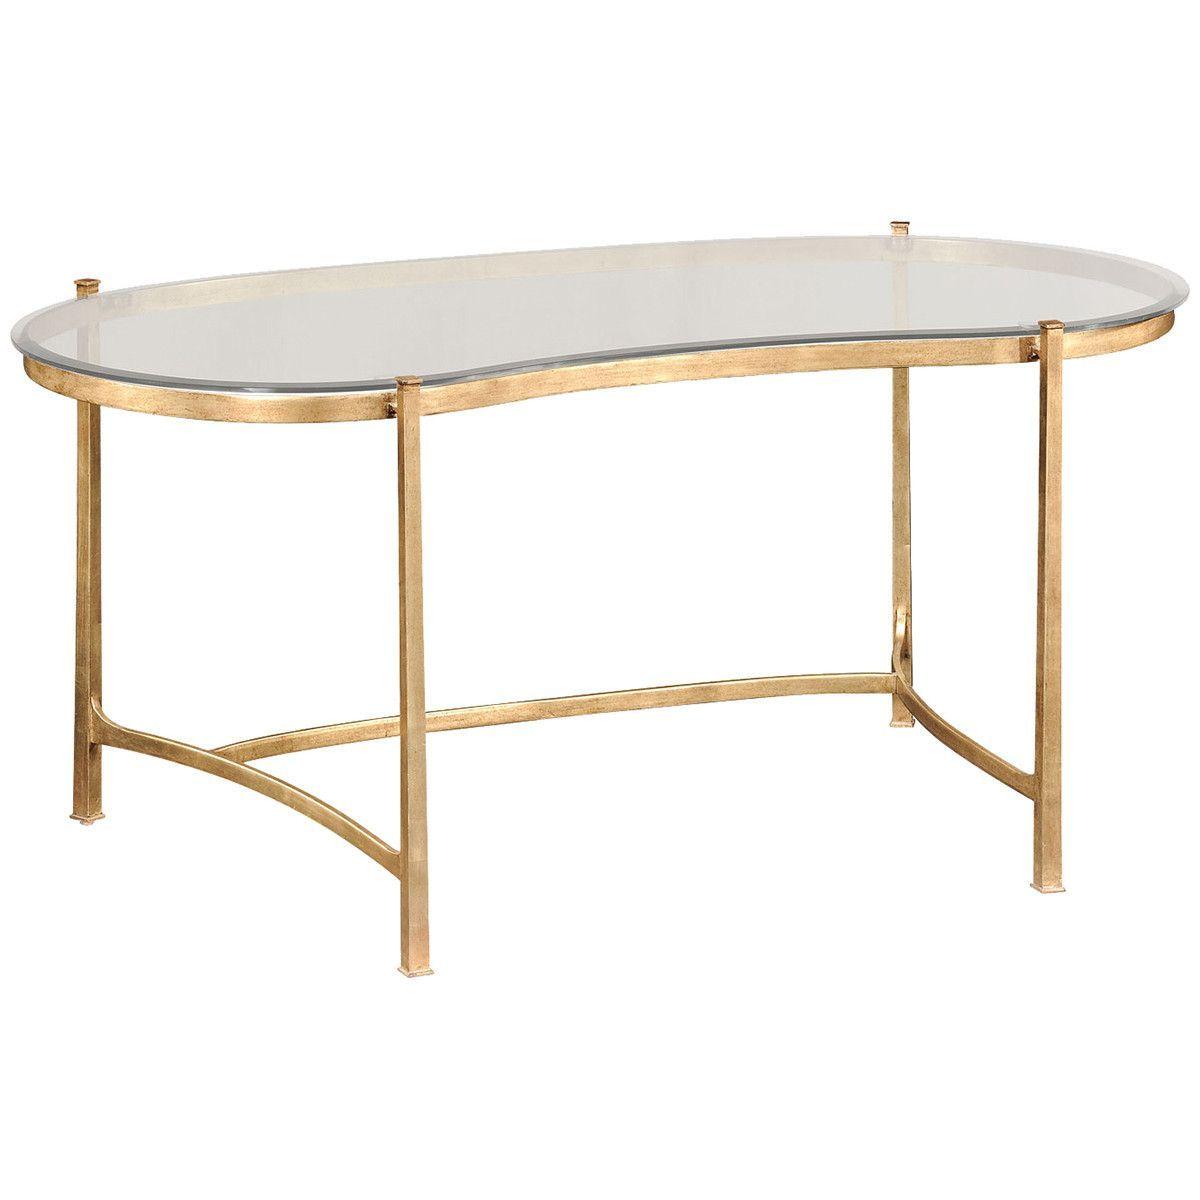 Jonathan Charles Kidney Desk And Glass Top Clearance Sale Kidney Shaped Desk Luxury Desk Glass Desk